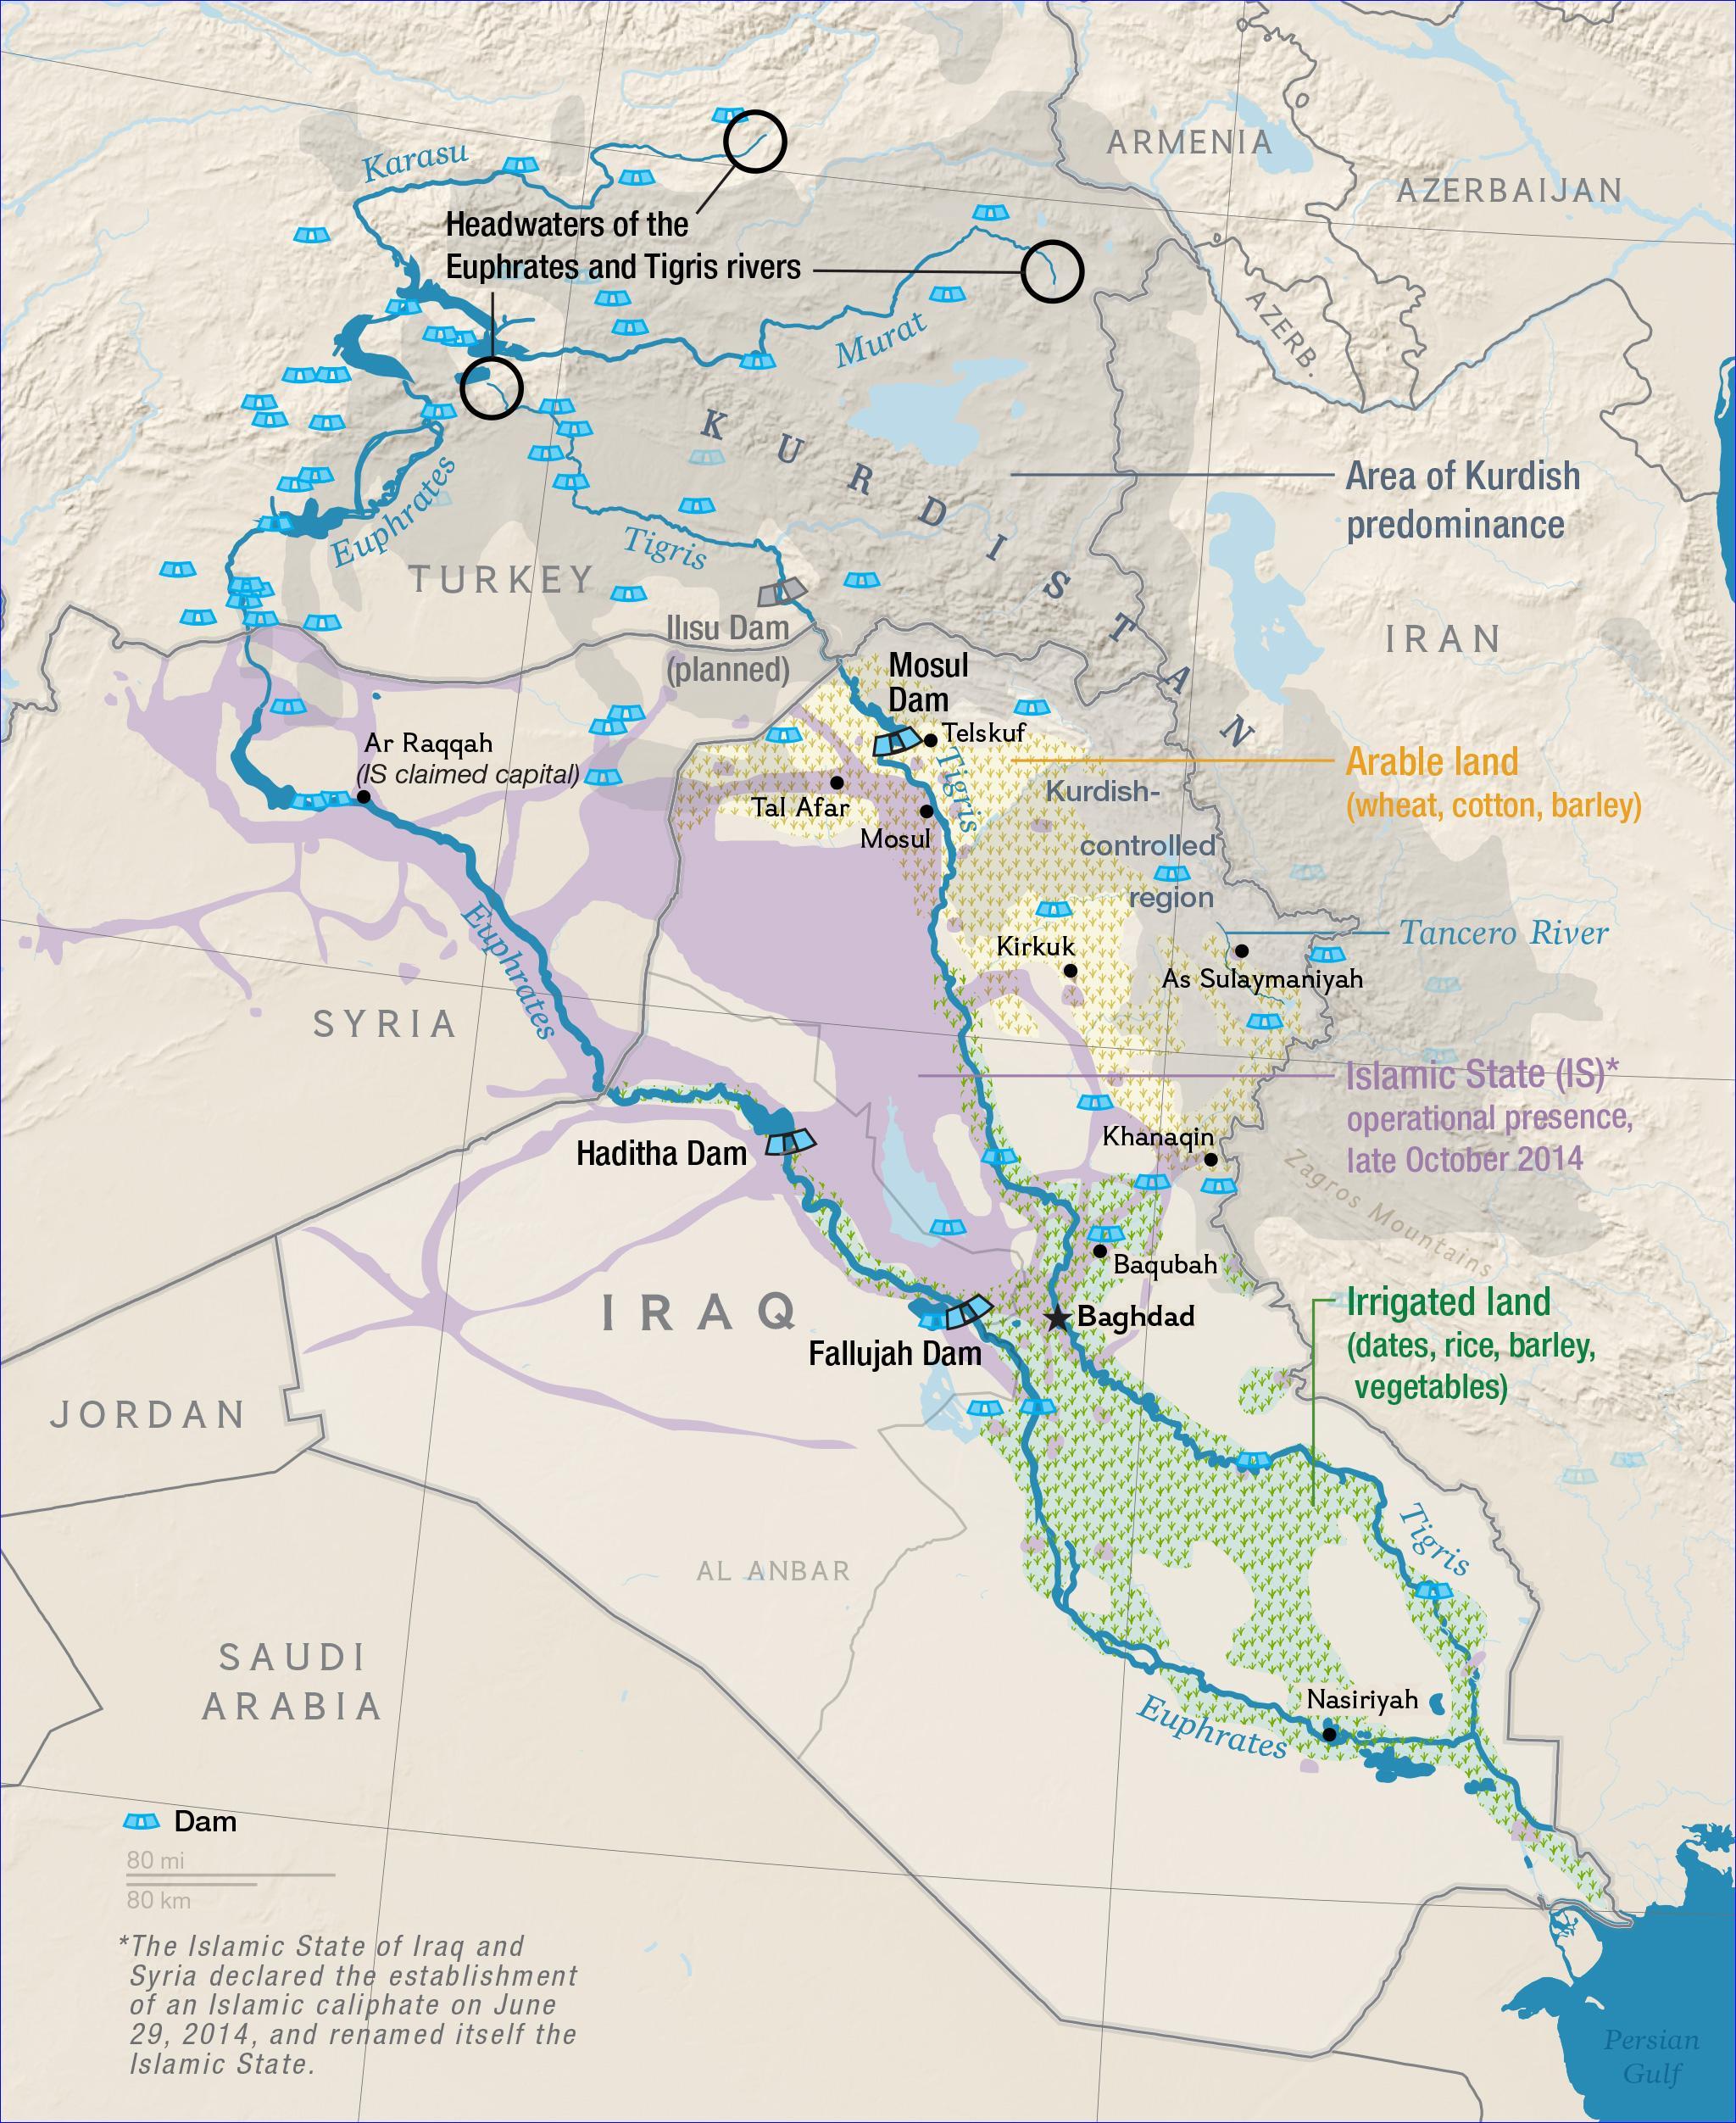 Amid Terror Attacks Iraq Faces Water Crisis